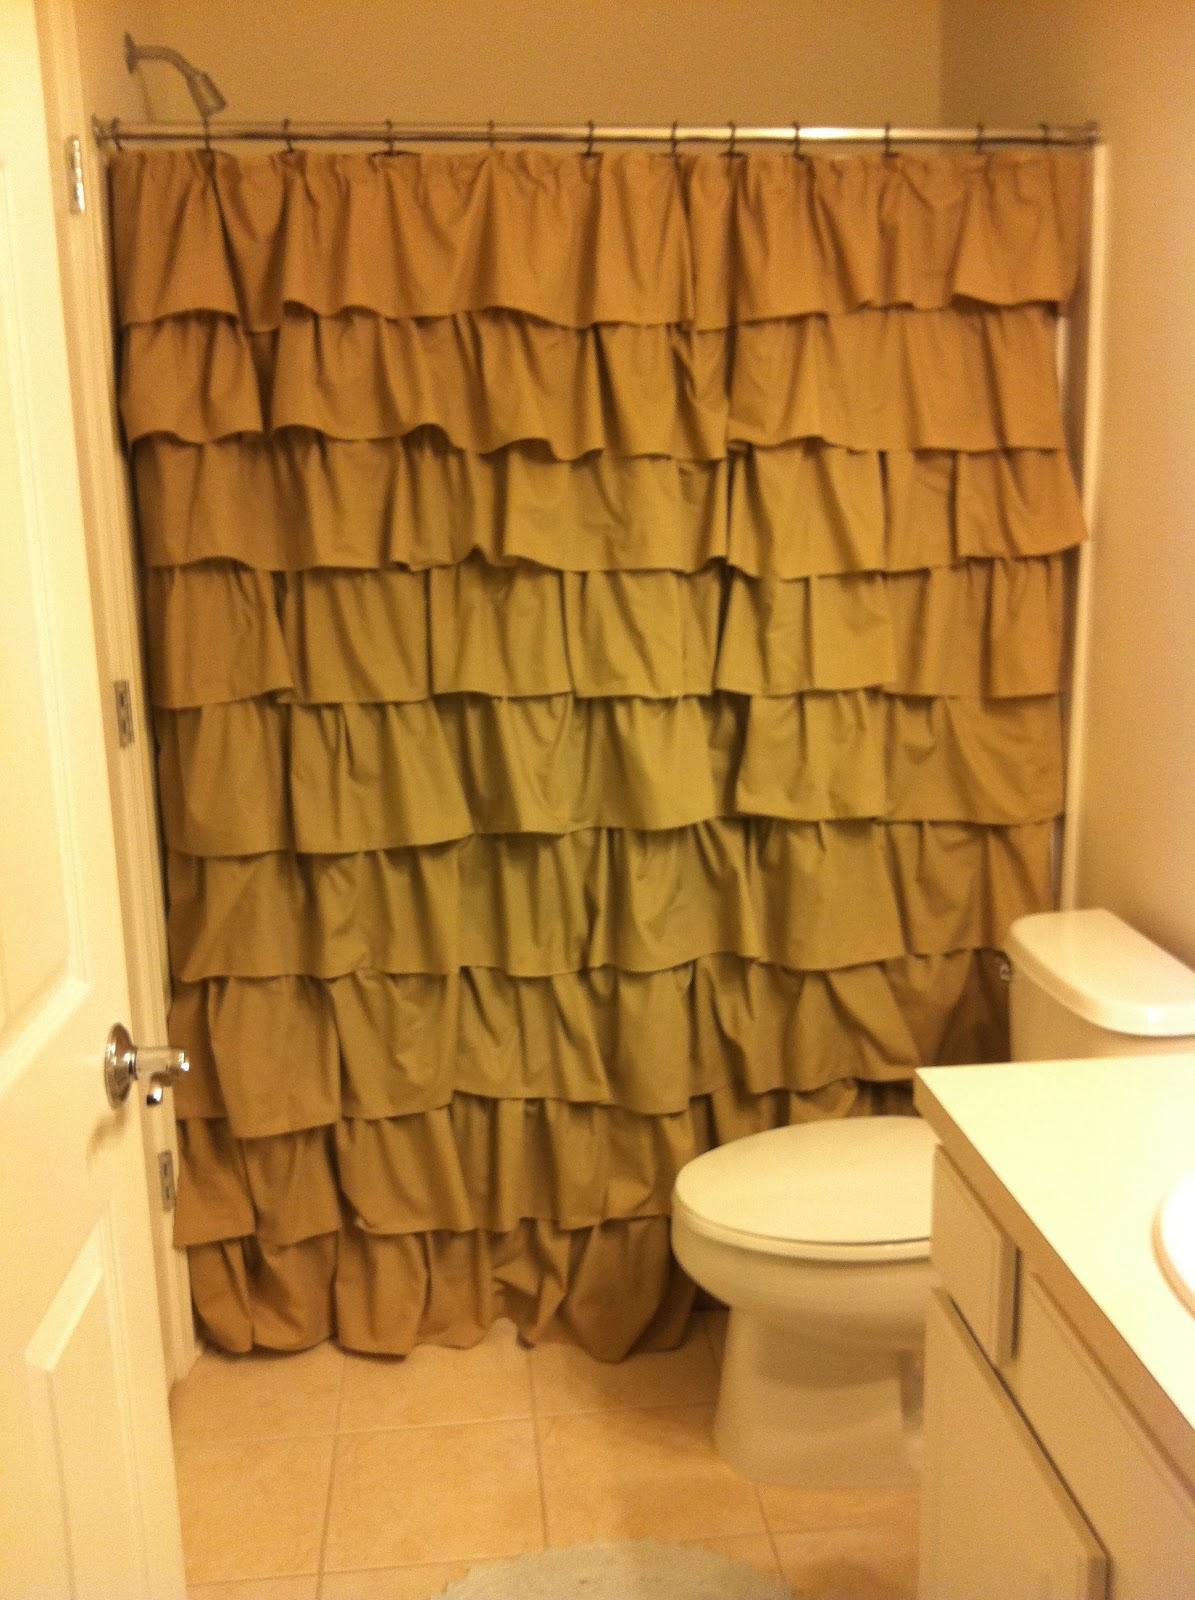 Diy ruffled shower curtain -  10 Diy Ruffle Shower Curtain